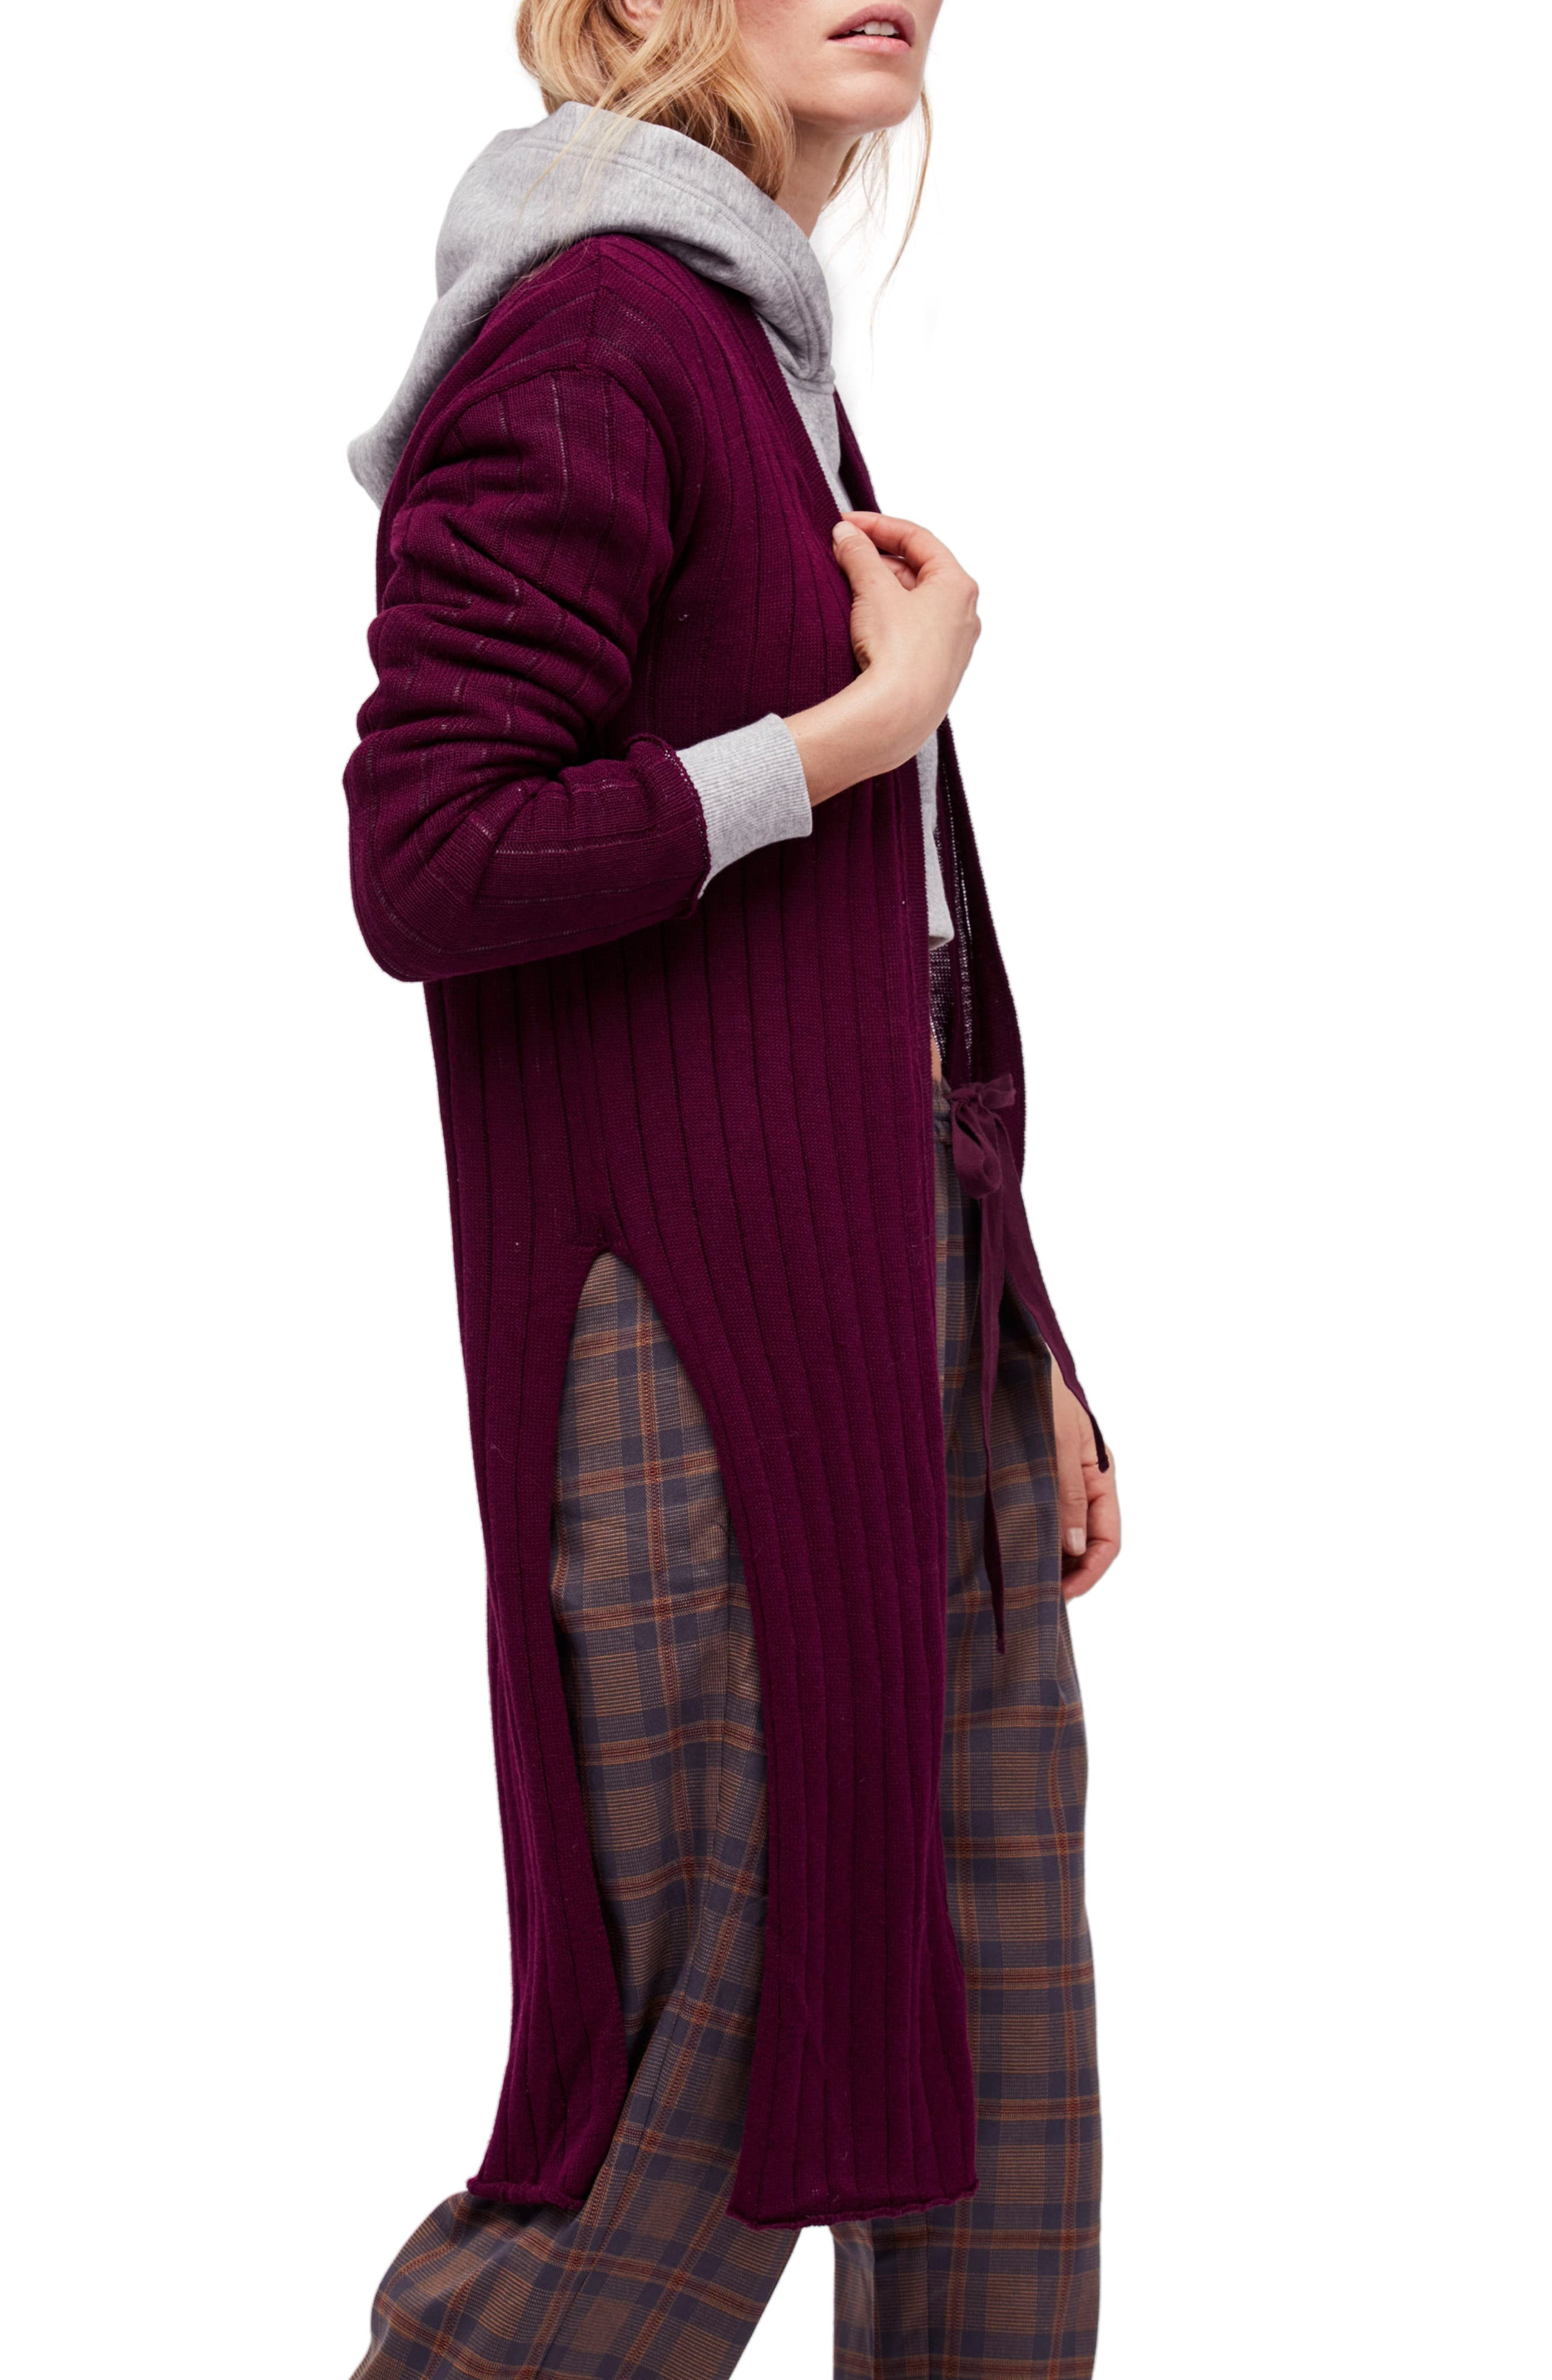 Alternate Image 1 Selected - Free People Ribby Long Cardigan